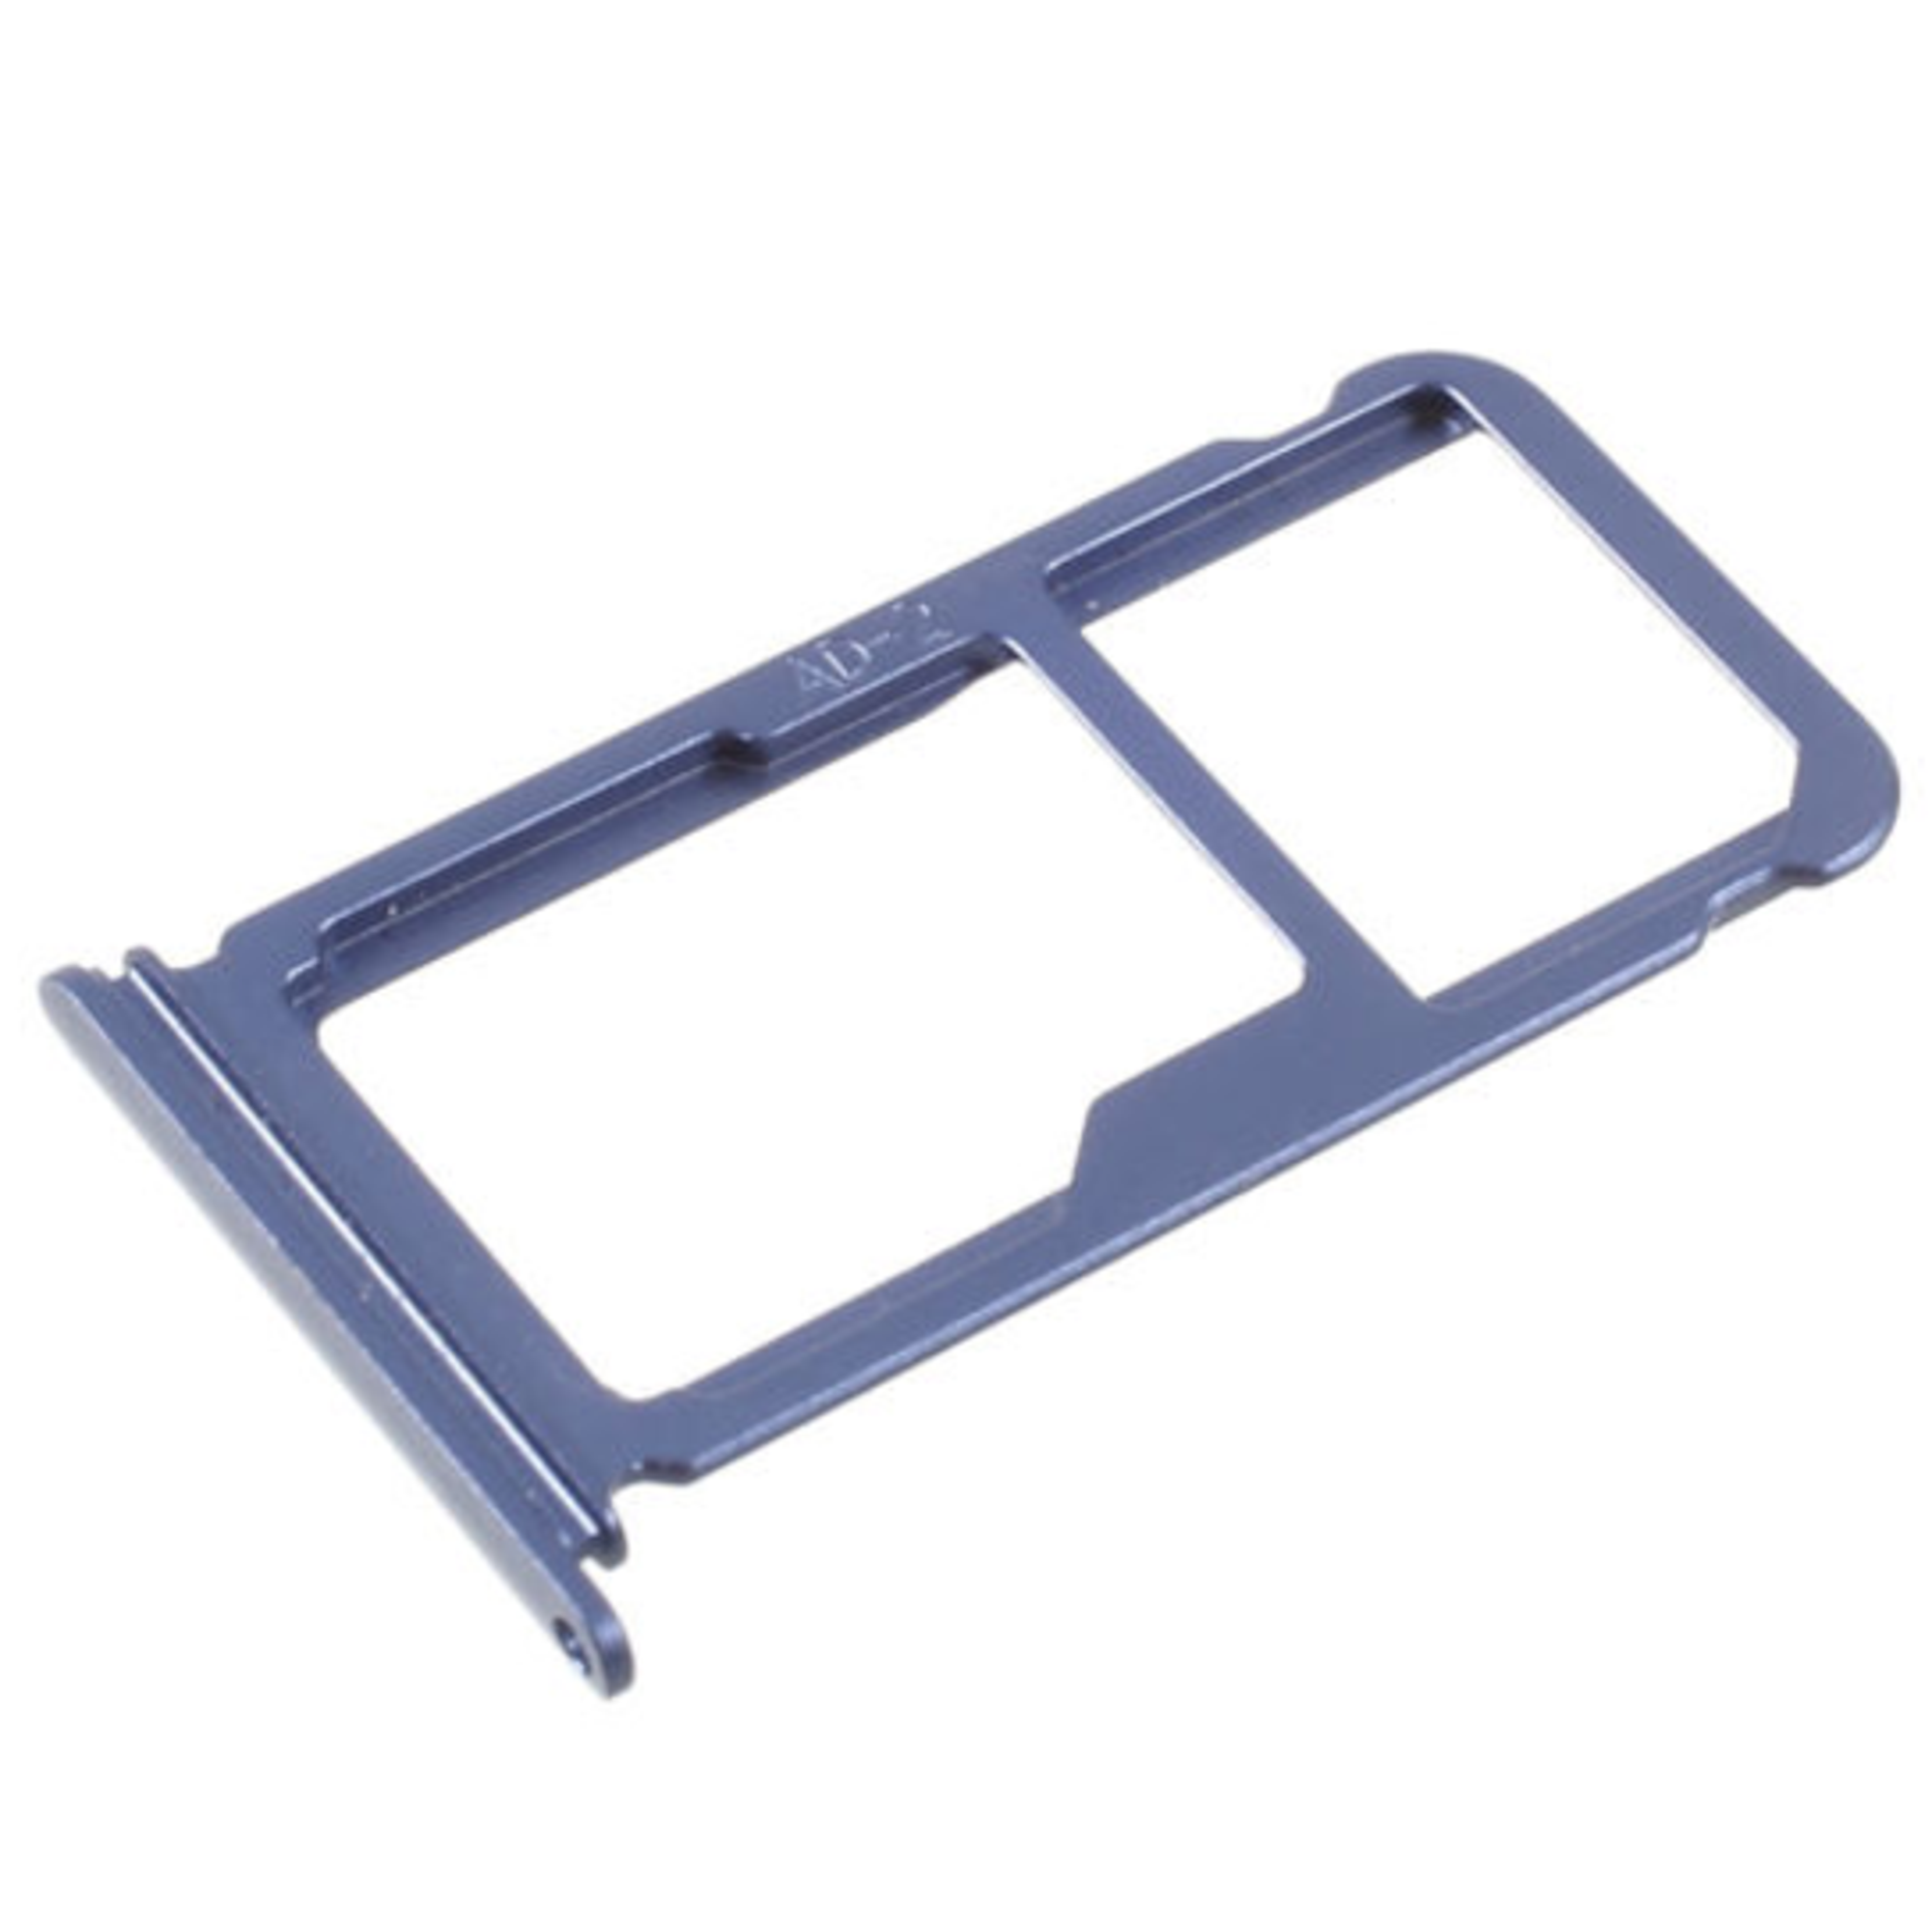 Huawei P10 Sim Karte.Huawei P10 Plus Sim Card Tray And Sd Card Tray Replacement Blue